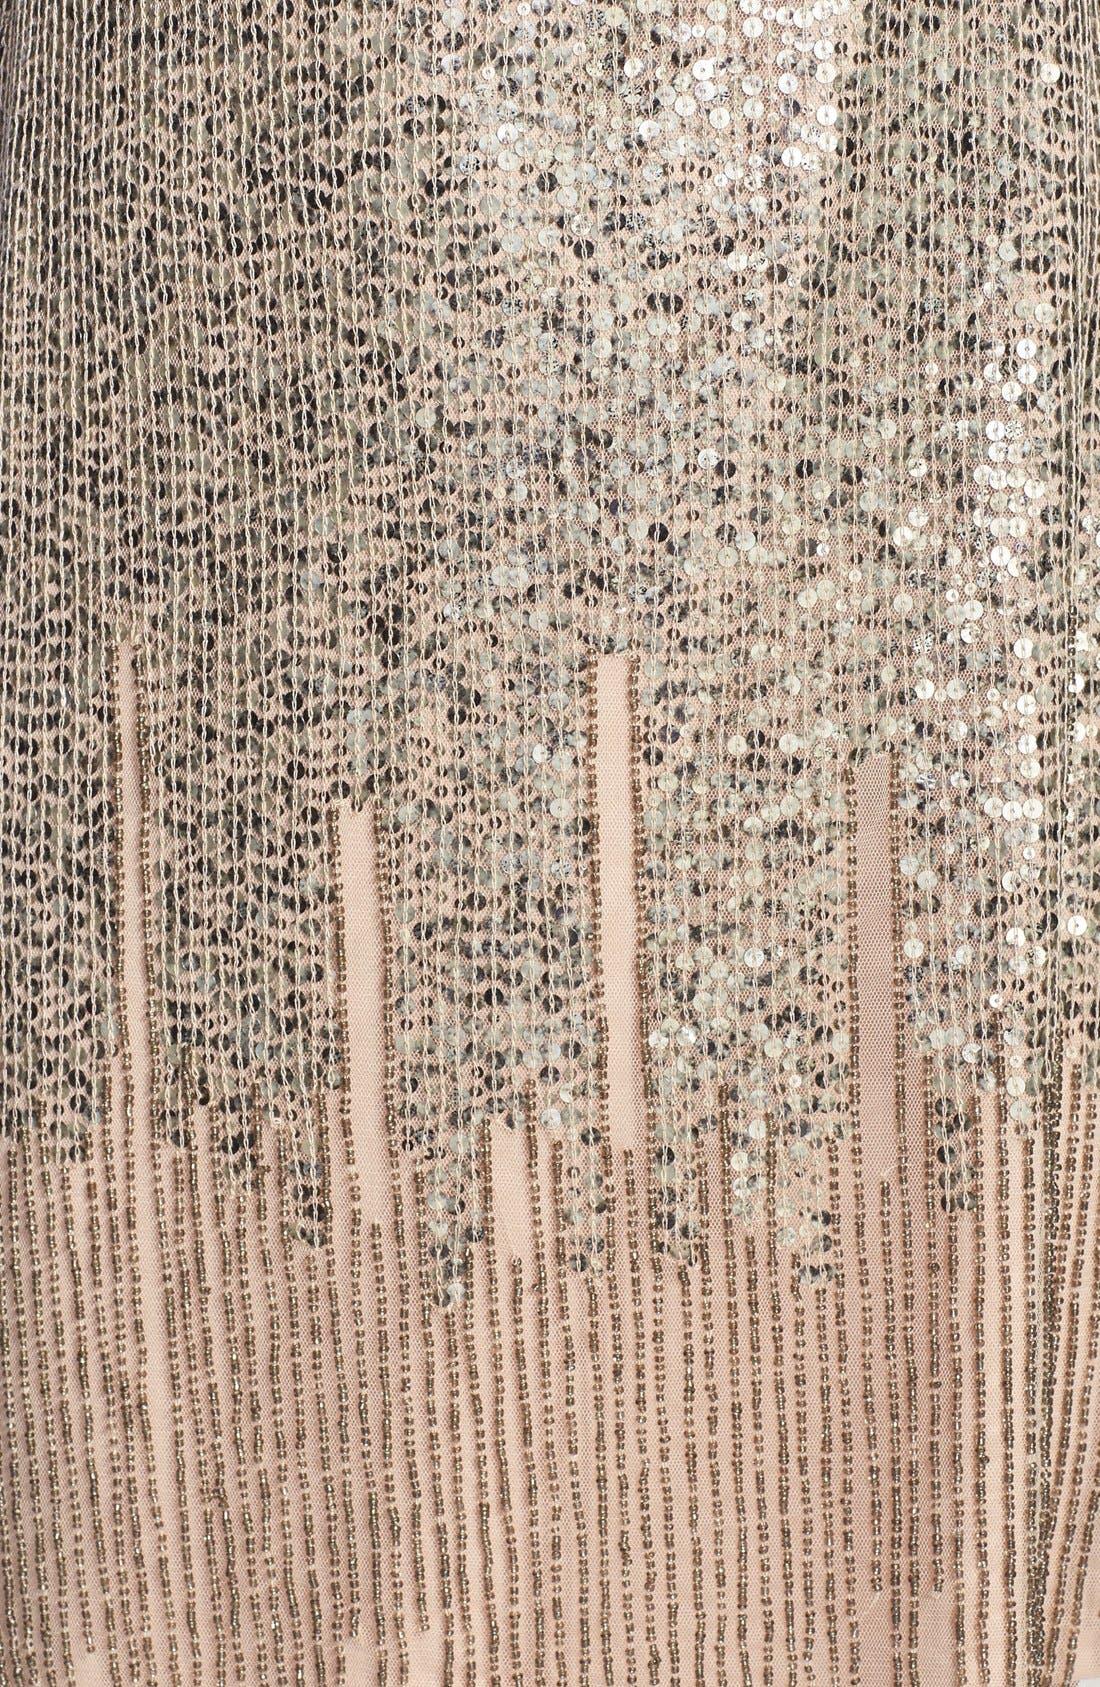 Illusion Yoke Beaded Sheath Dress,                             Alternate thumbnail 3, color,                             Taupe/ Pink